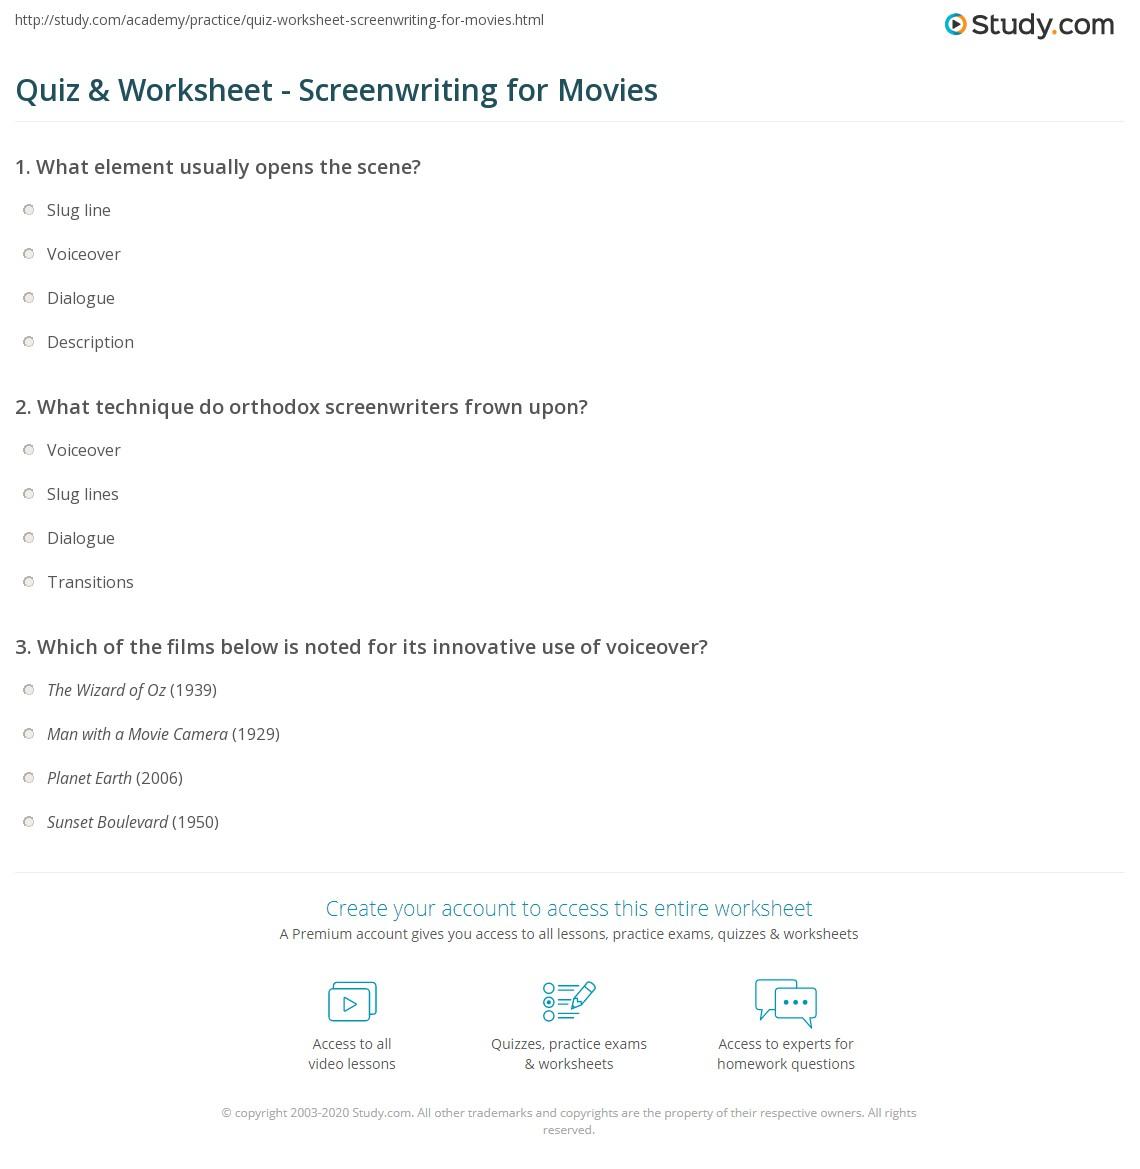 Quiz & Worksheet - Screenwriting for Movies | Study com